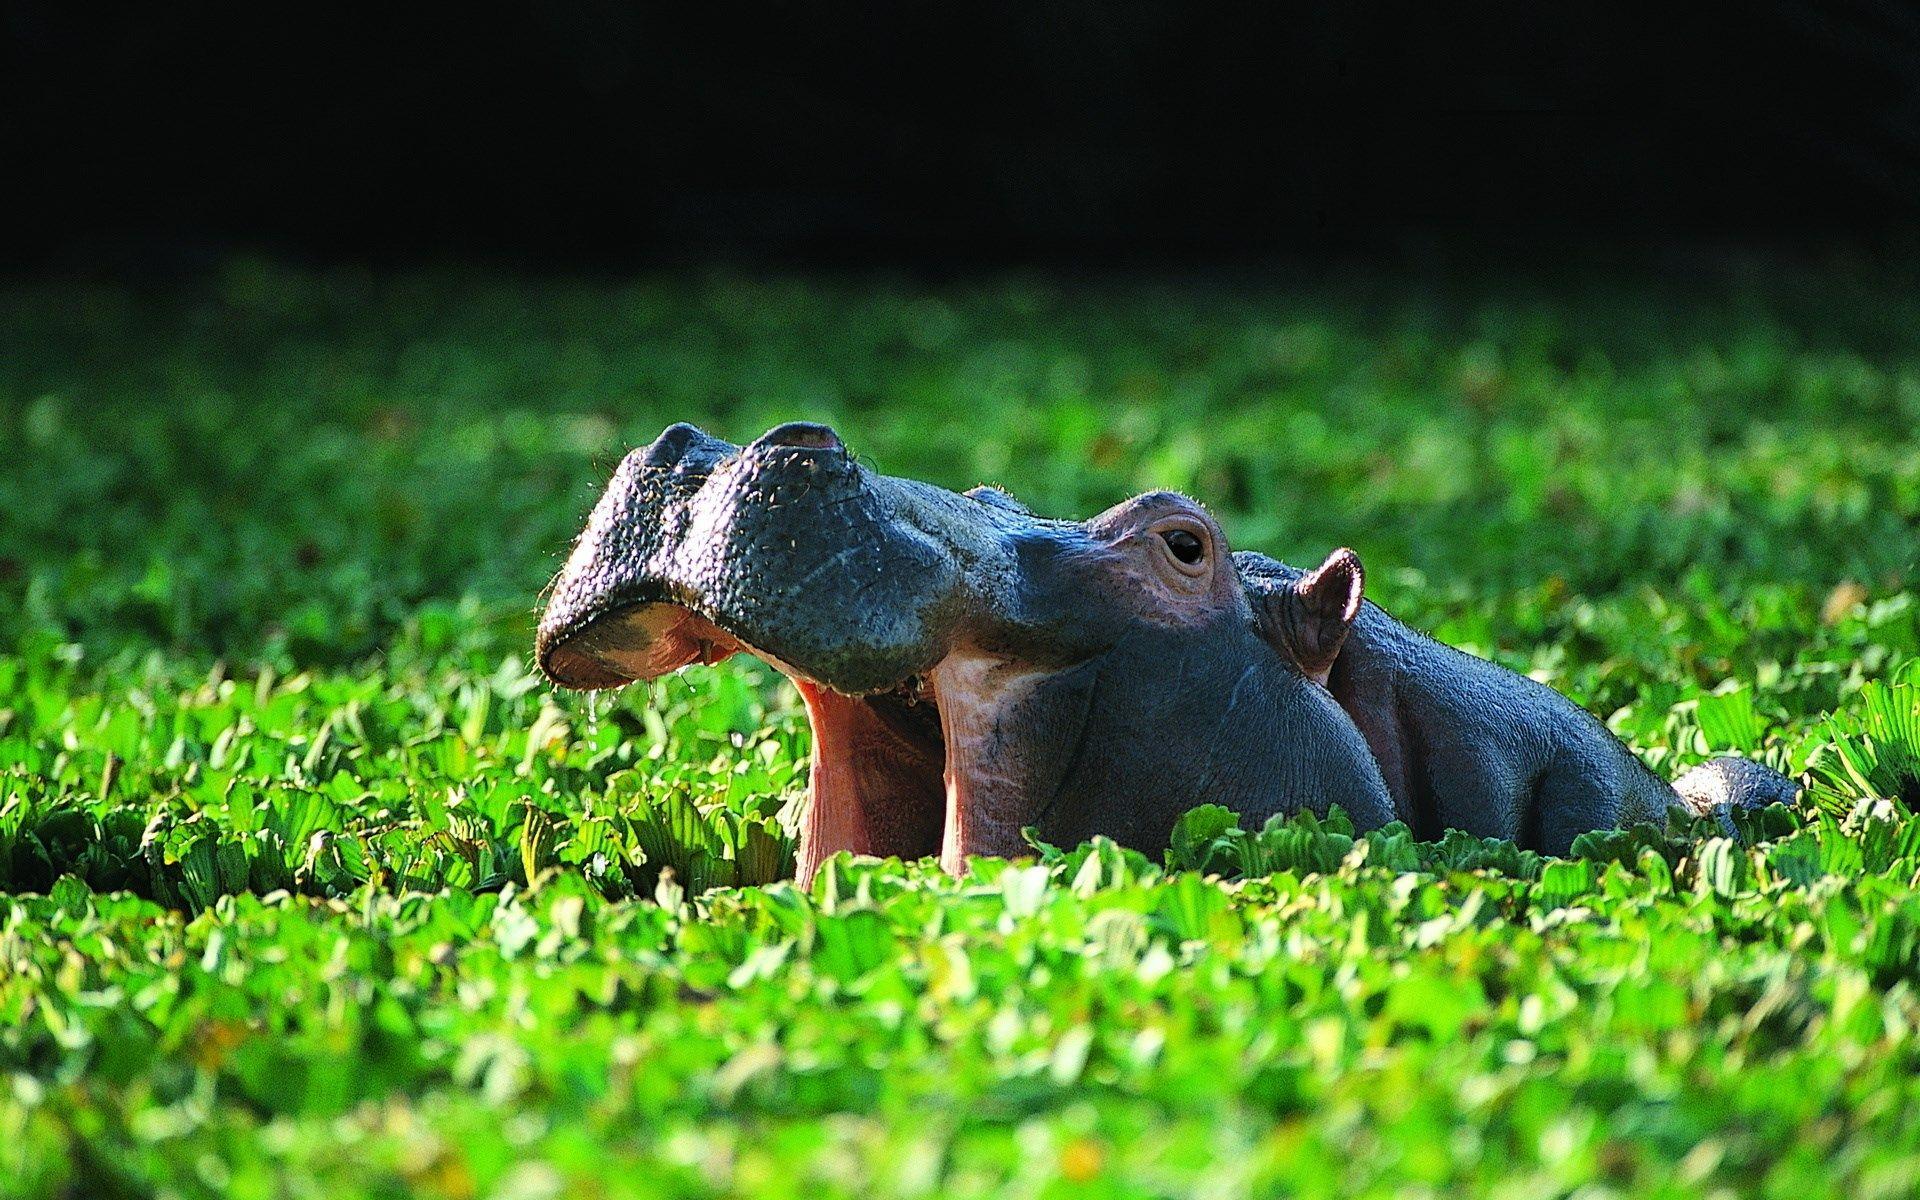 1426181 Images For Desktop Hippo Wallpaper Hippopotamus Animals Animal Wallpaper